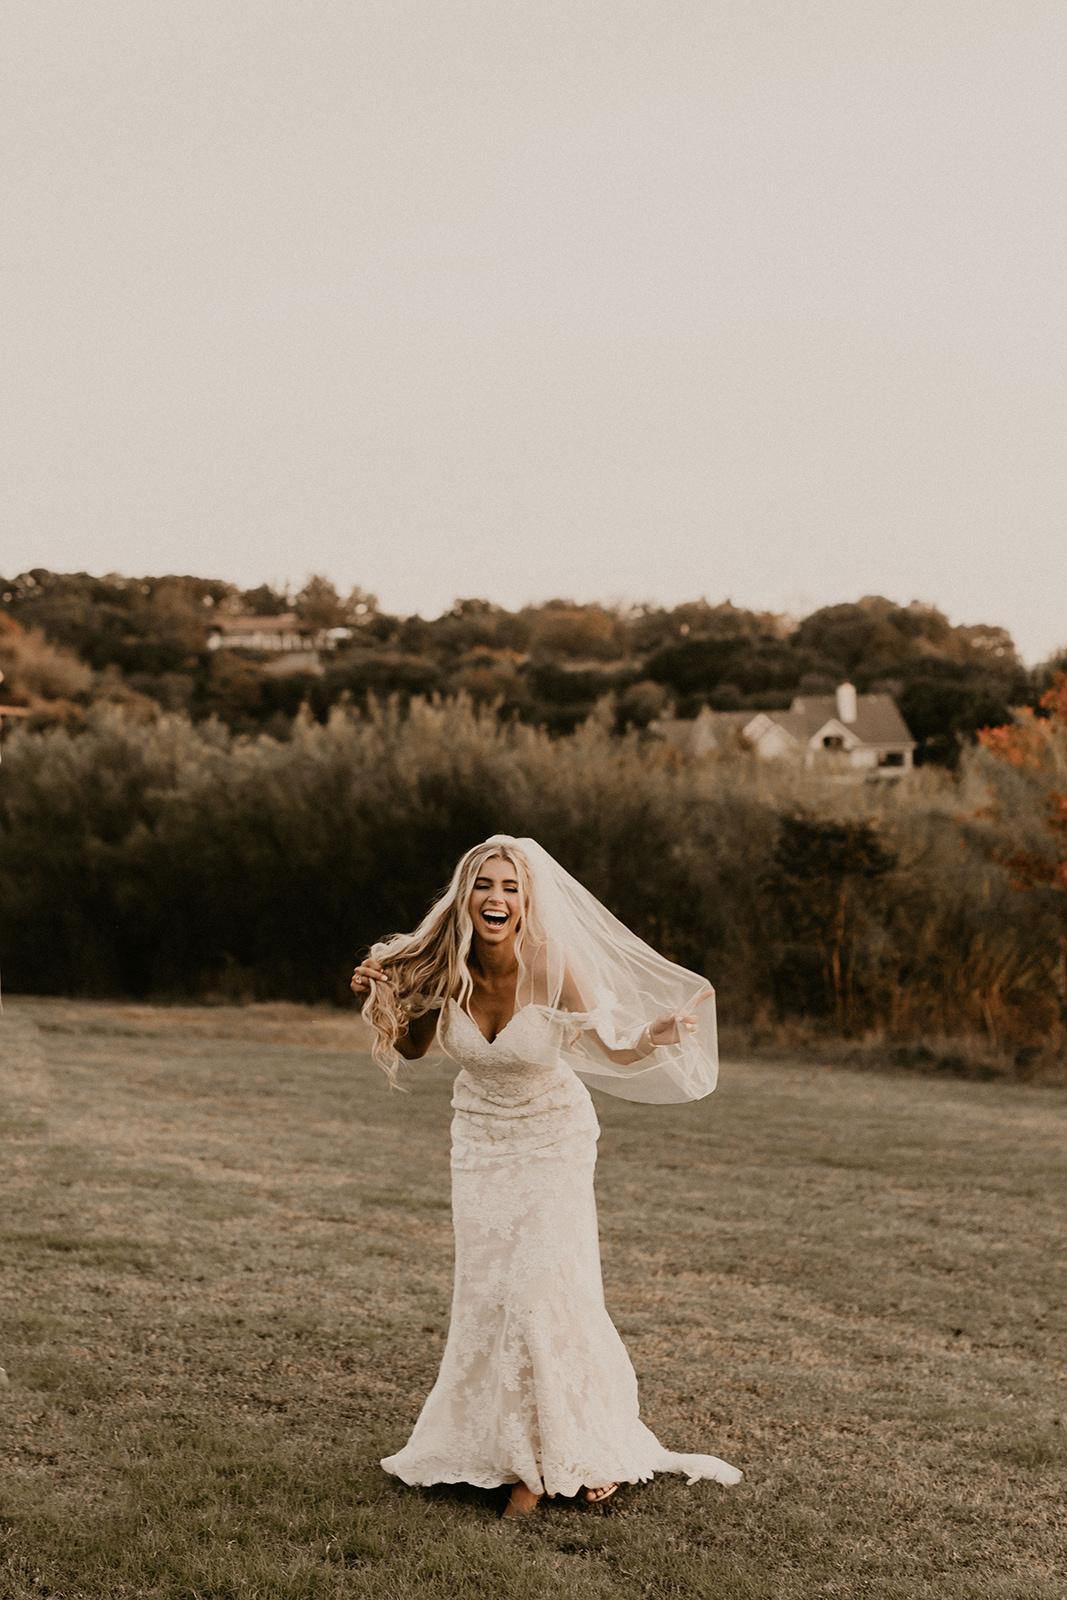 allie-tyler-vintage-villas-austin-texas-wedding-photographer-3316.jpg